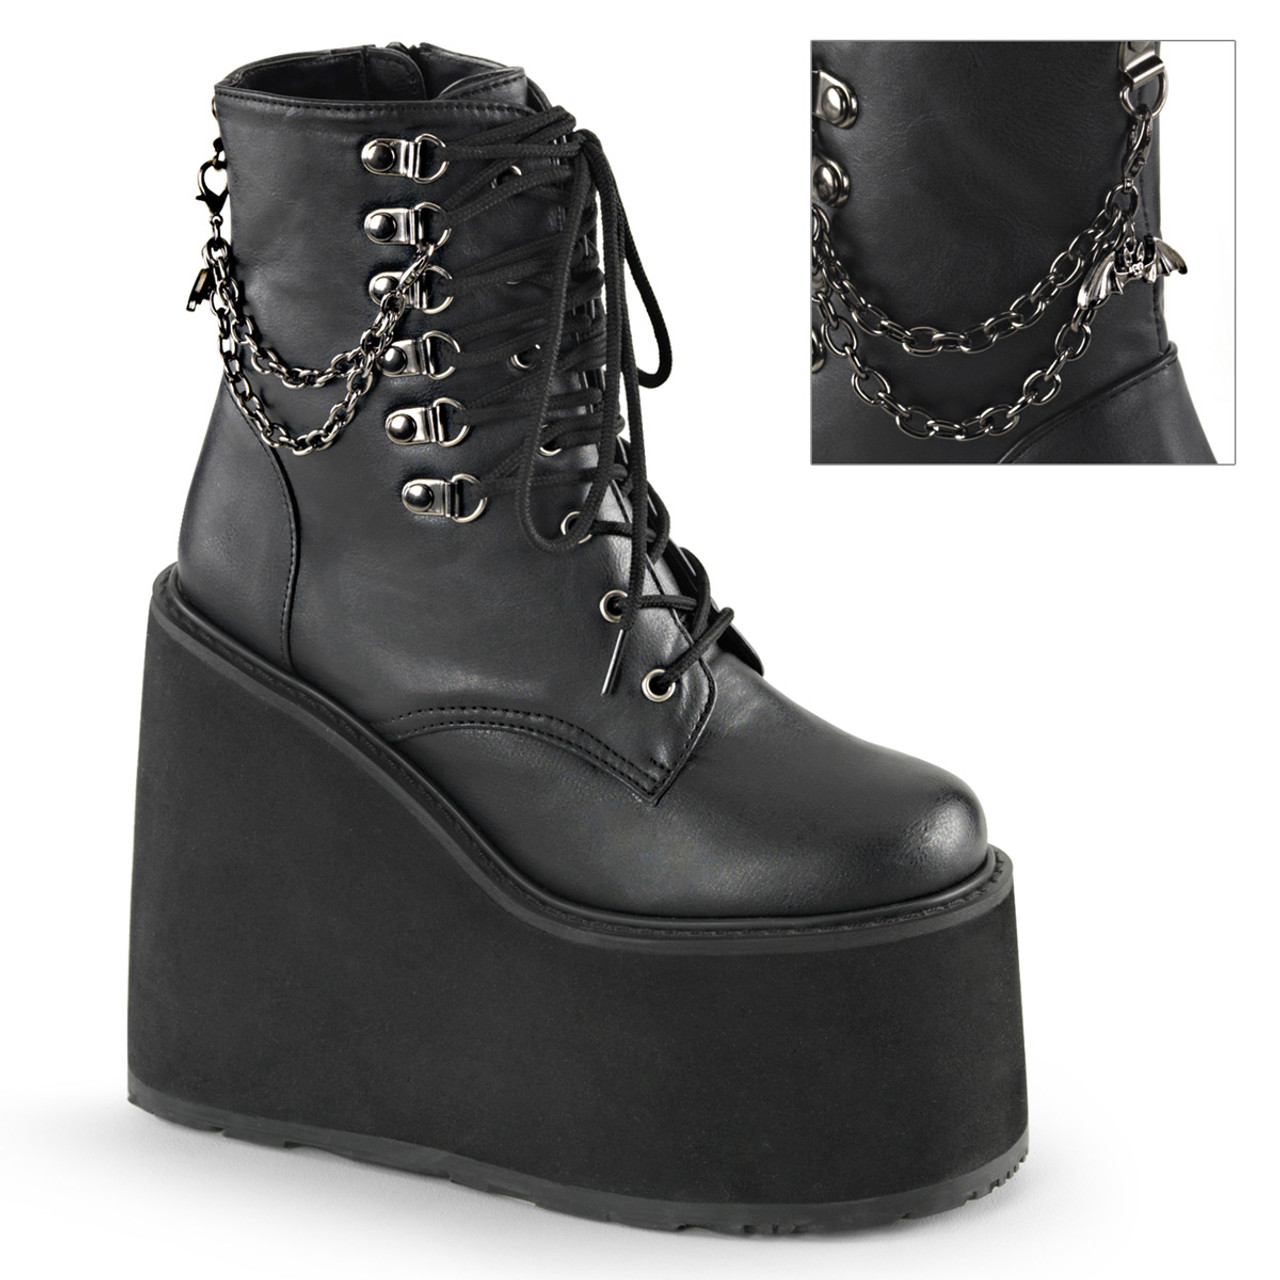 Demonia POISON-101 Women/'s Black Vegan Leather Wedge Platform w// Strap Calf Boot